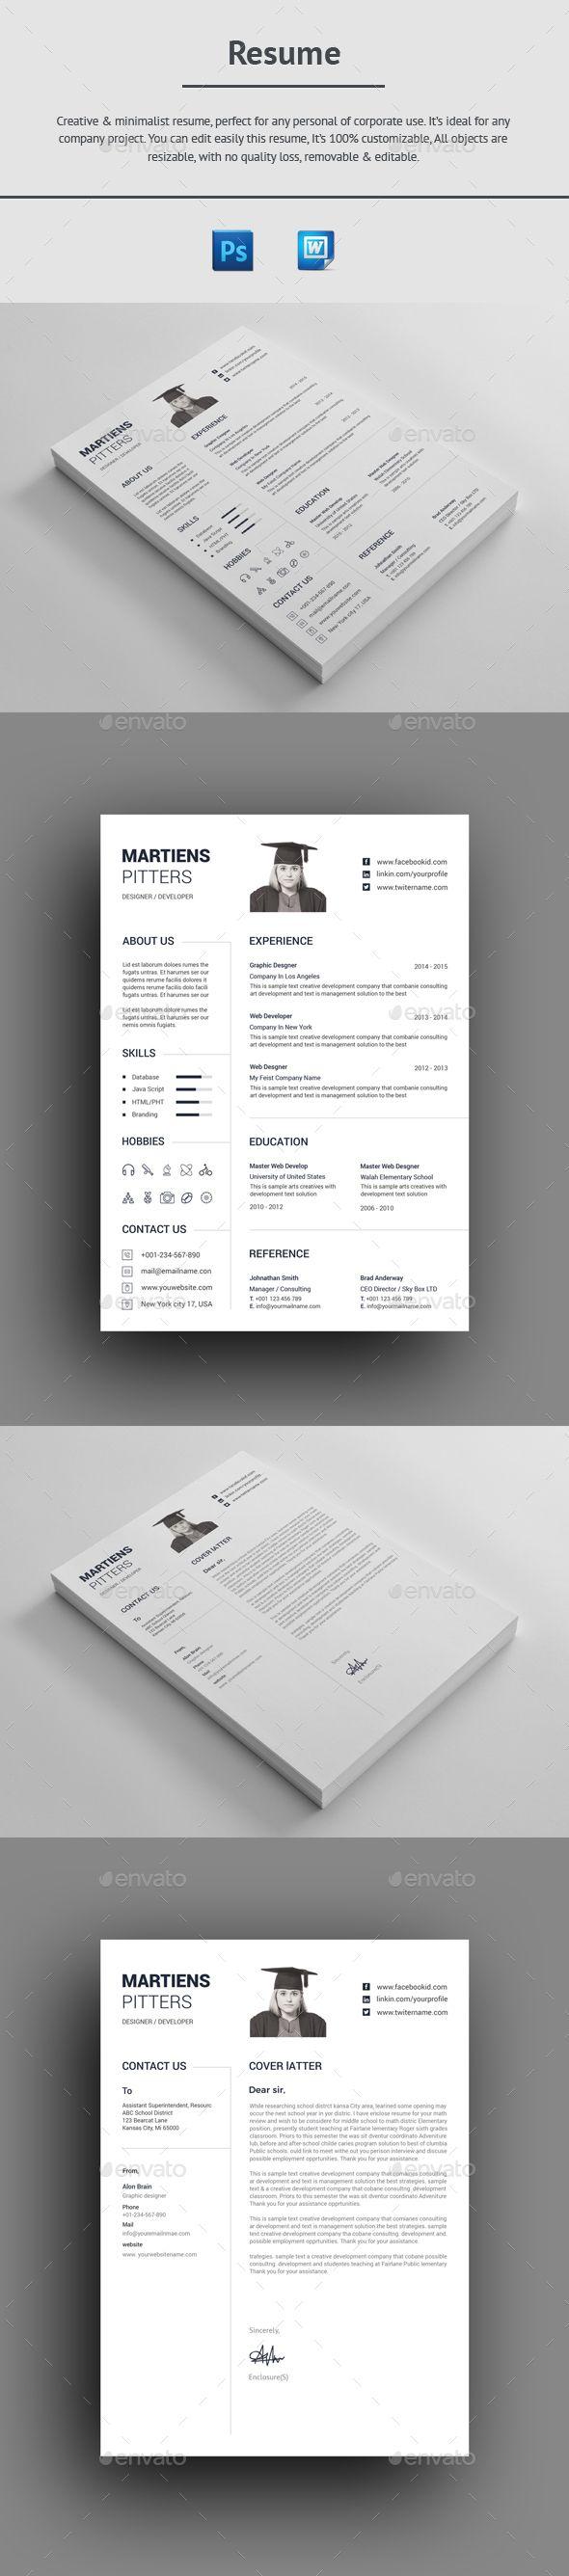 Resume   Resume Templates   Pinterest